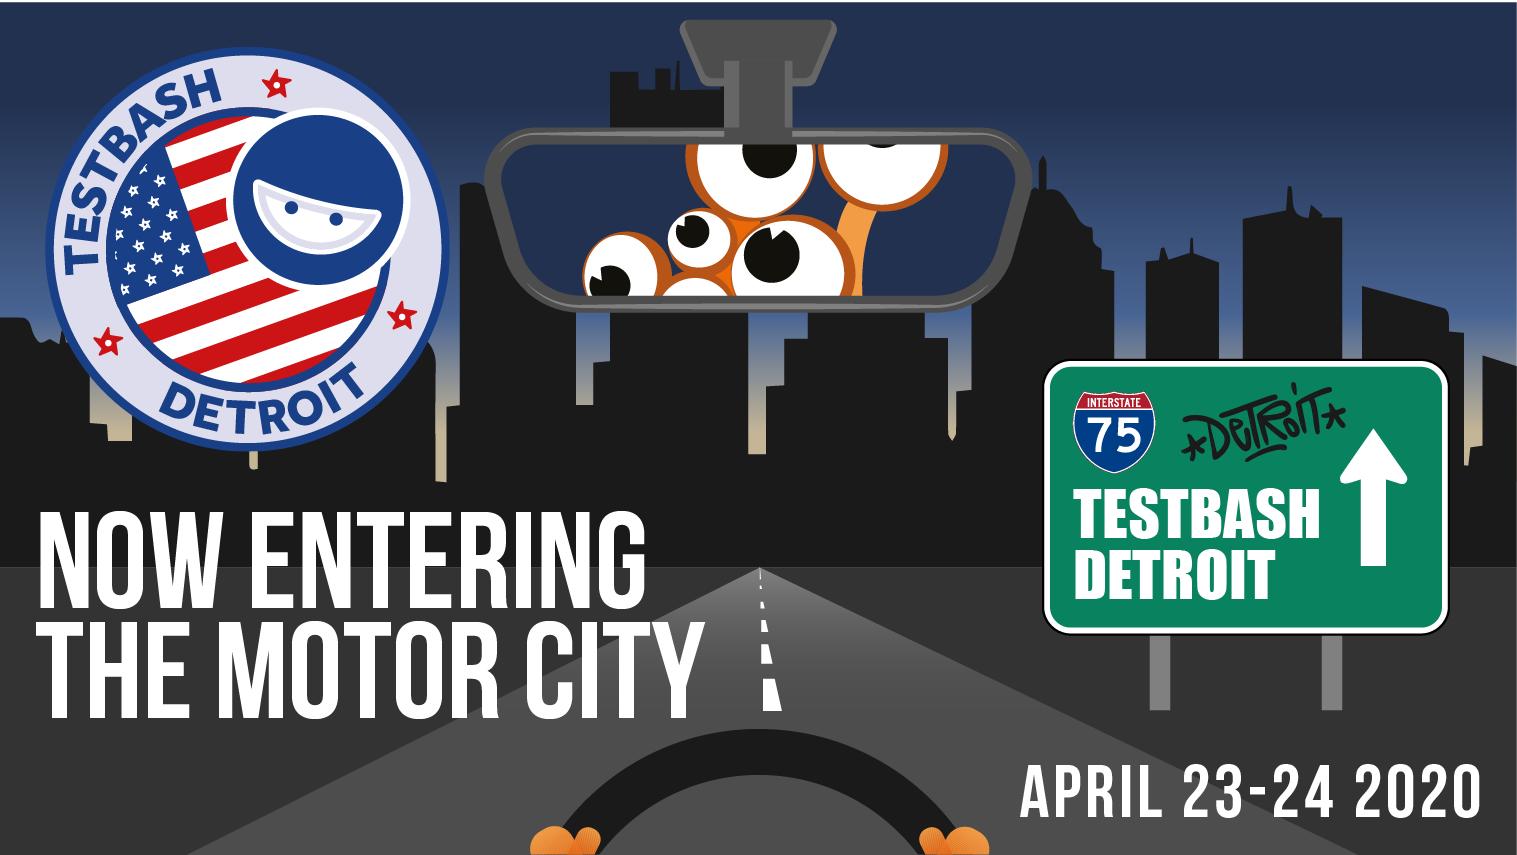 TestBash Detroit 2020, starts: 2020-04-23